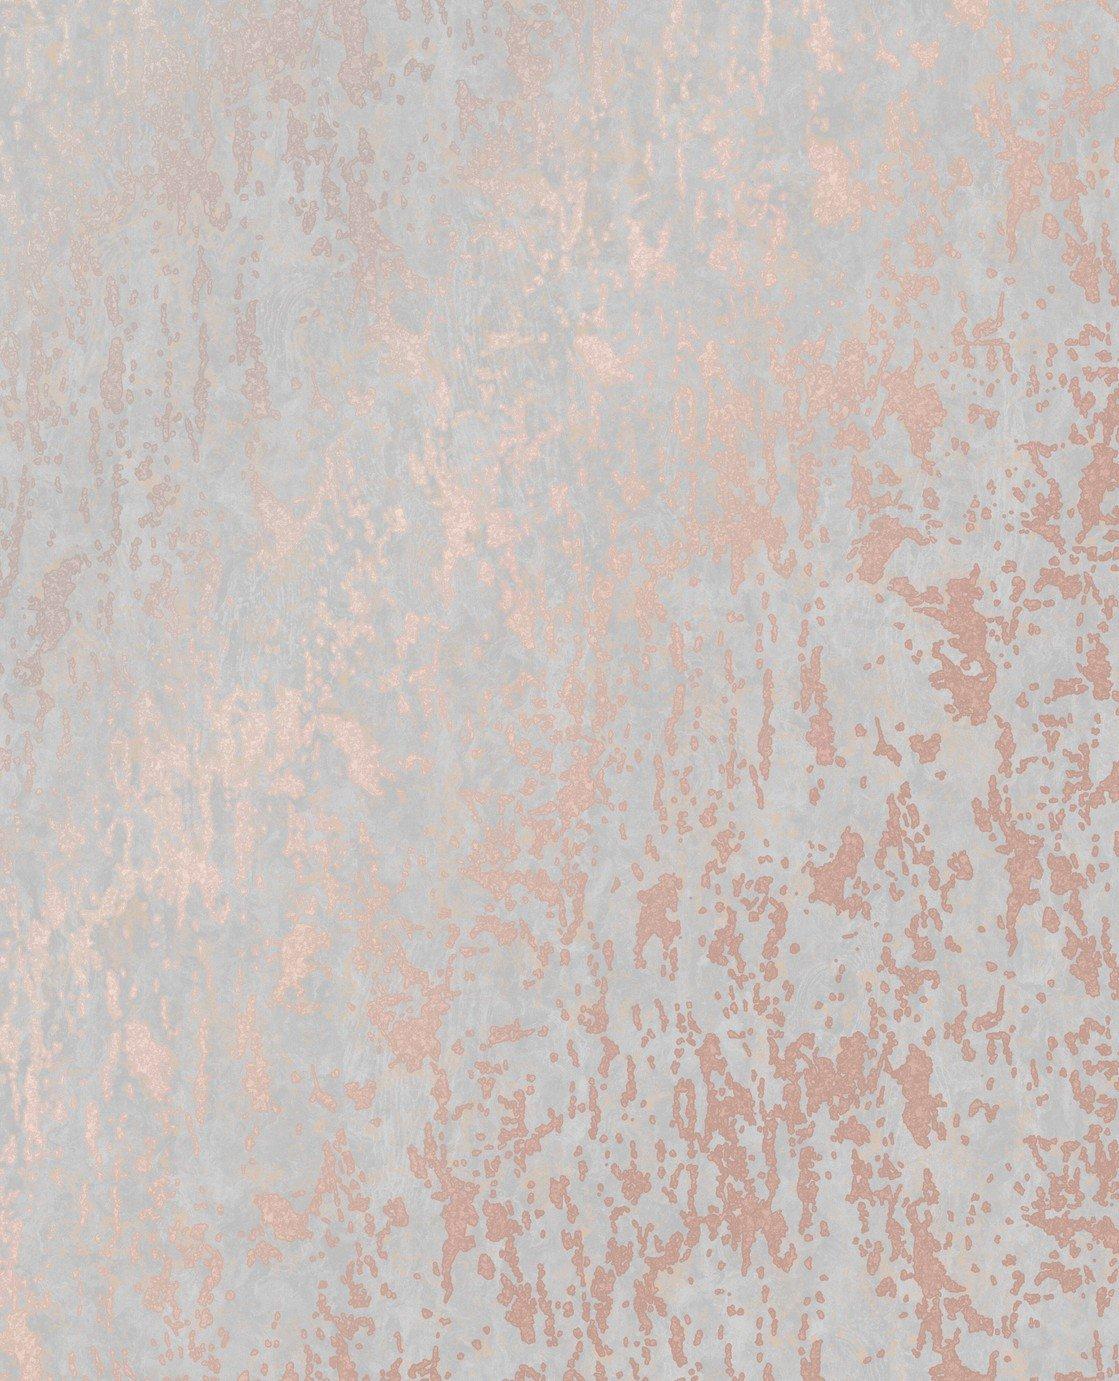 Superfresco Milan Rose Gold Textured Wallpaper